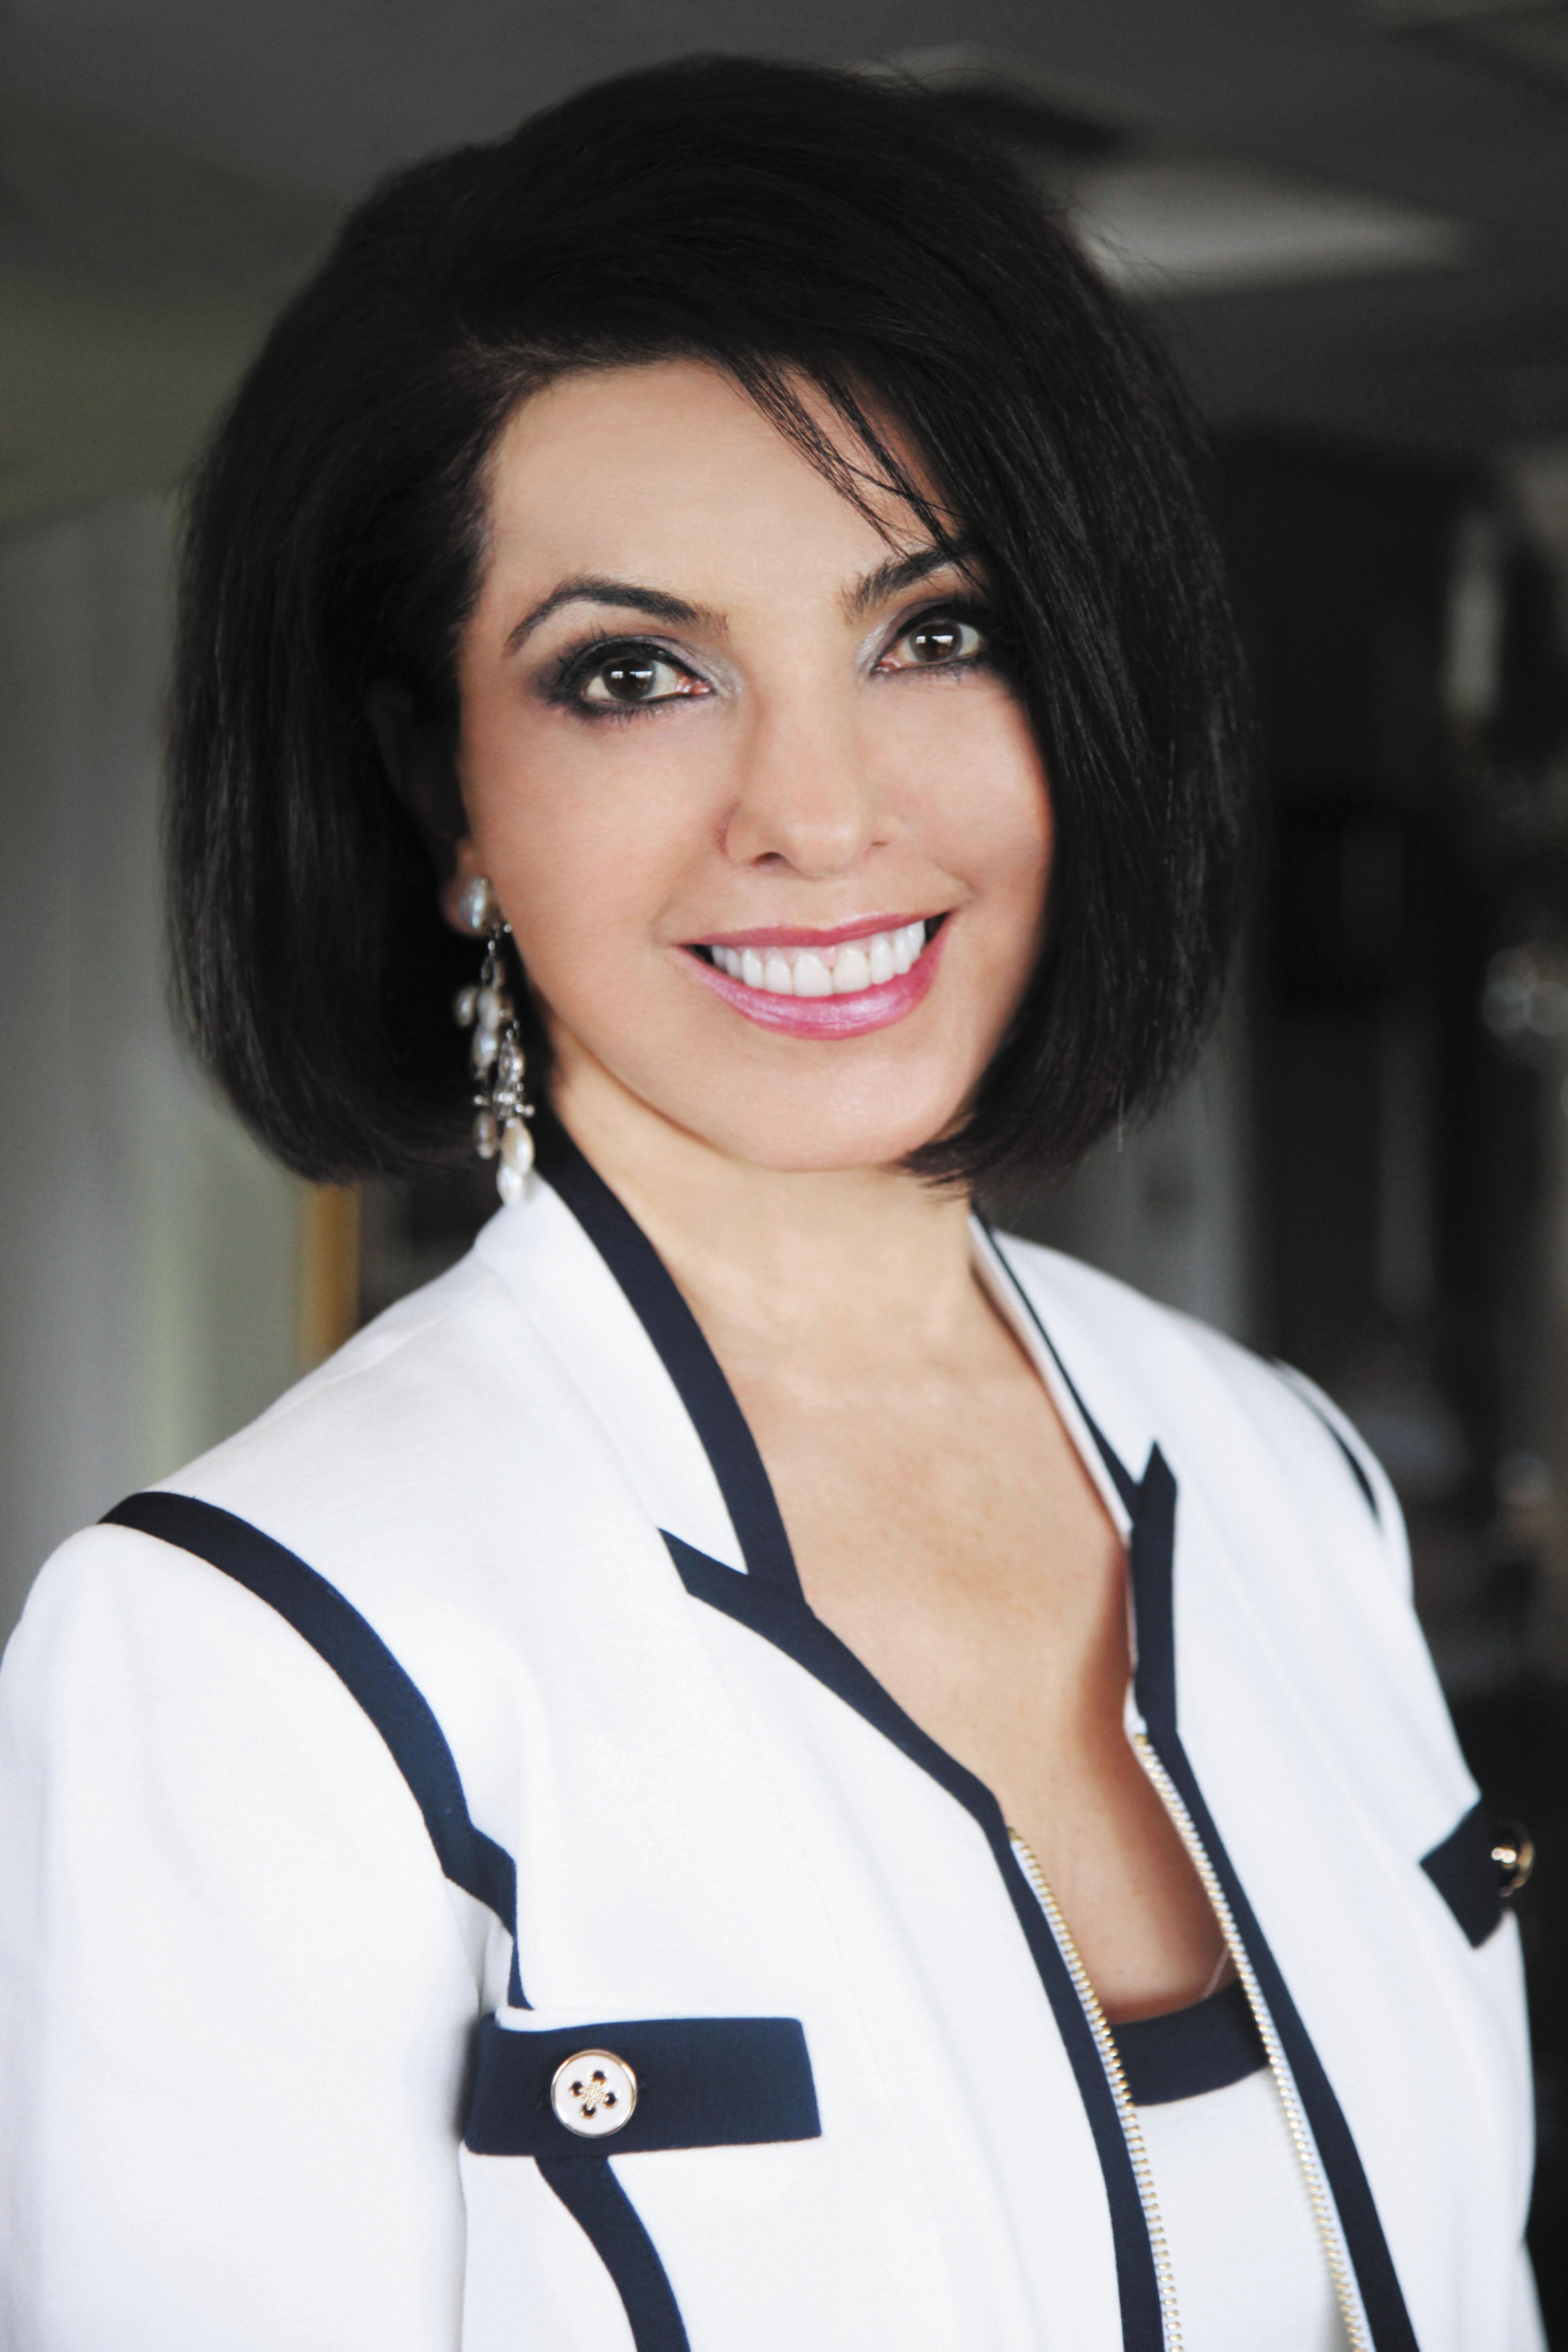 Laura Jean Sharkey Taliacarnerap